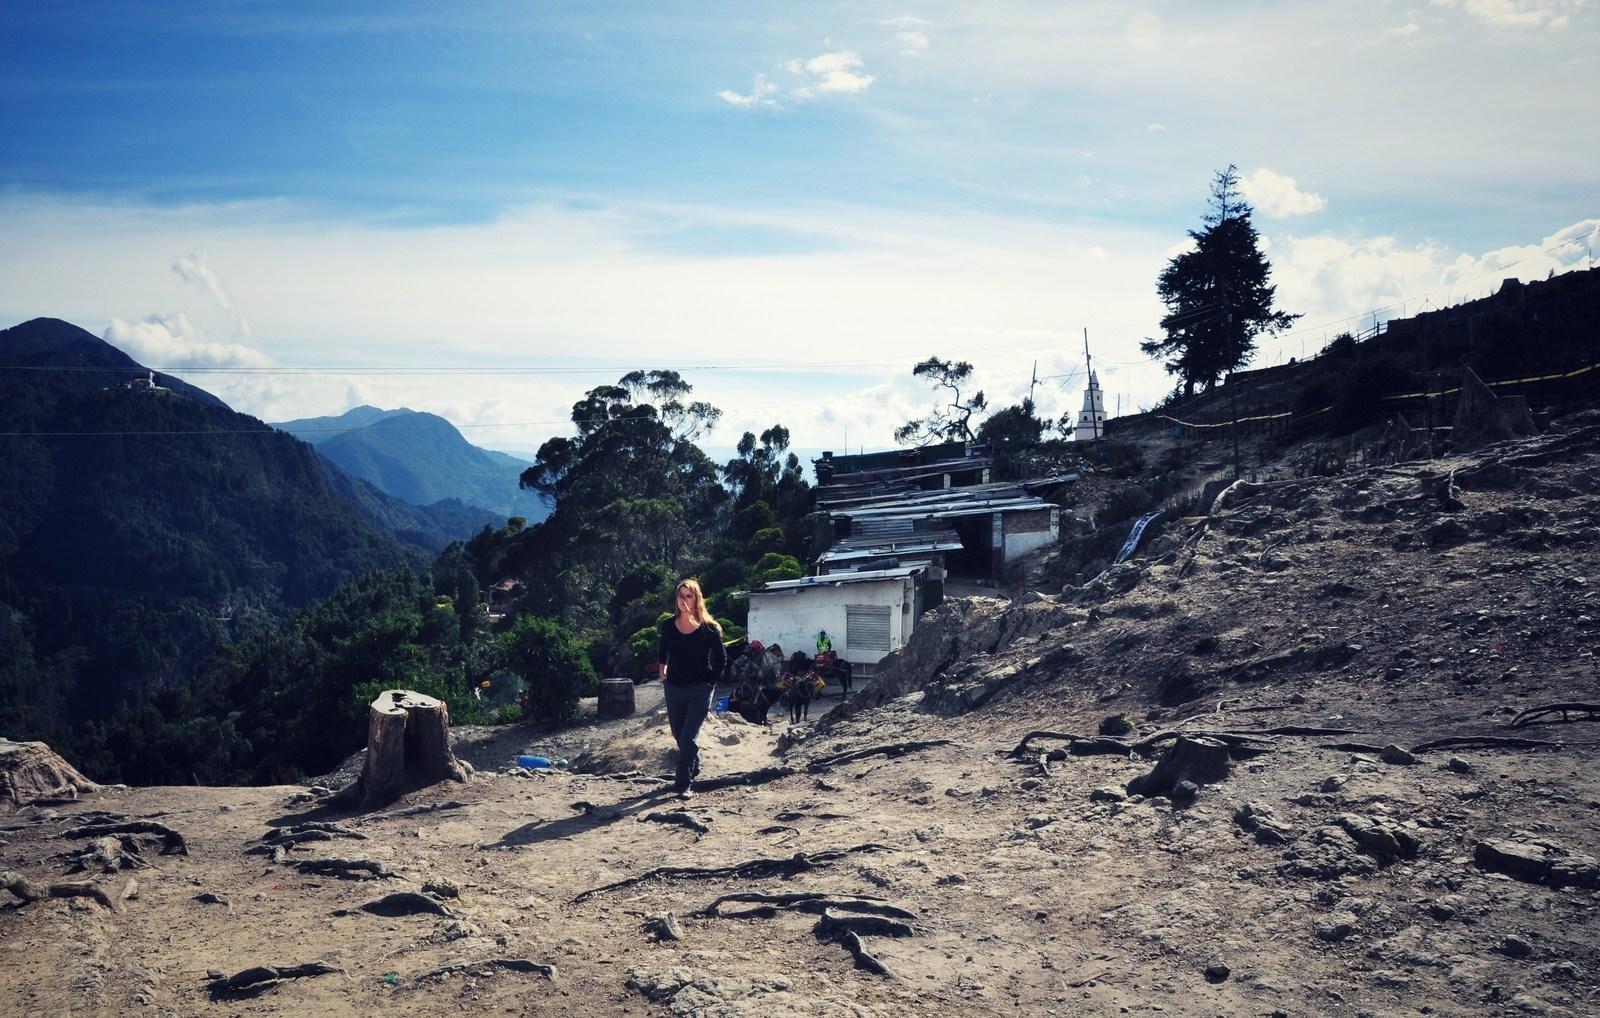 Montagne de Monserrate, Bogota Cerro de Monserrate